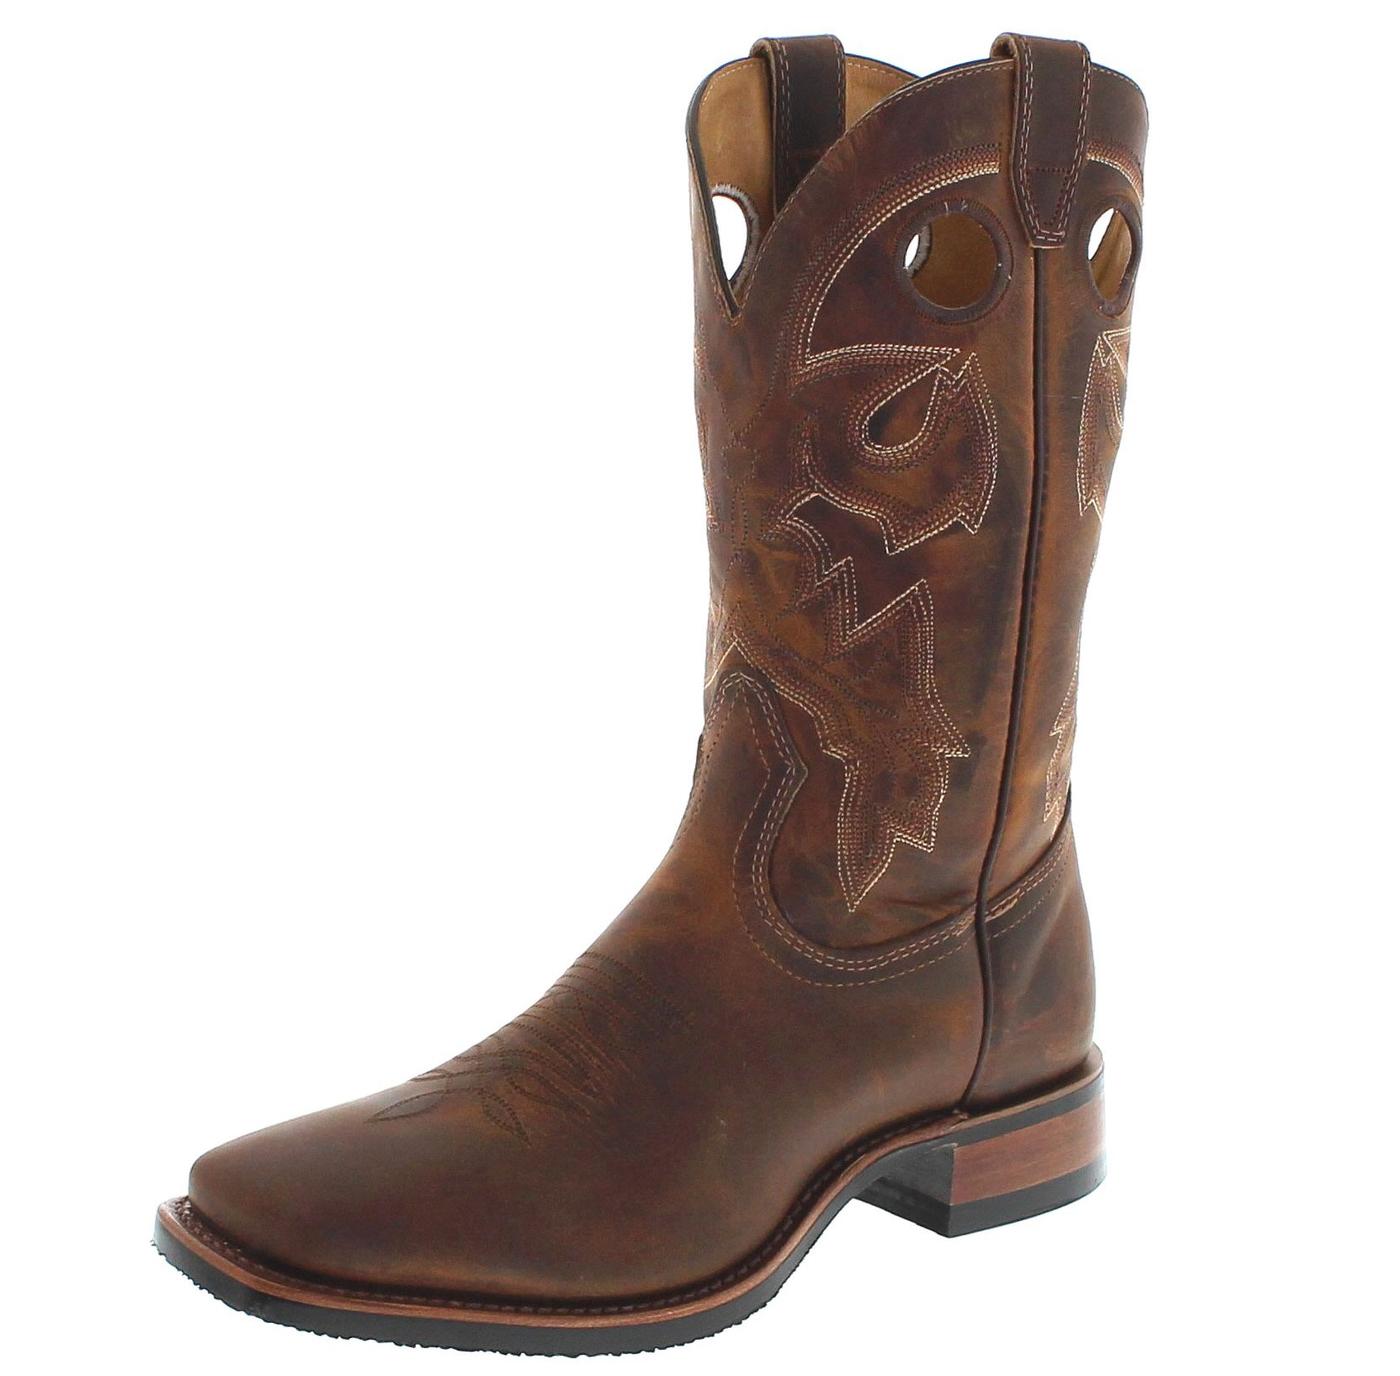 Boulet 6266 E Tan Spice Westernboots - brown